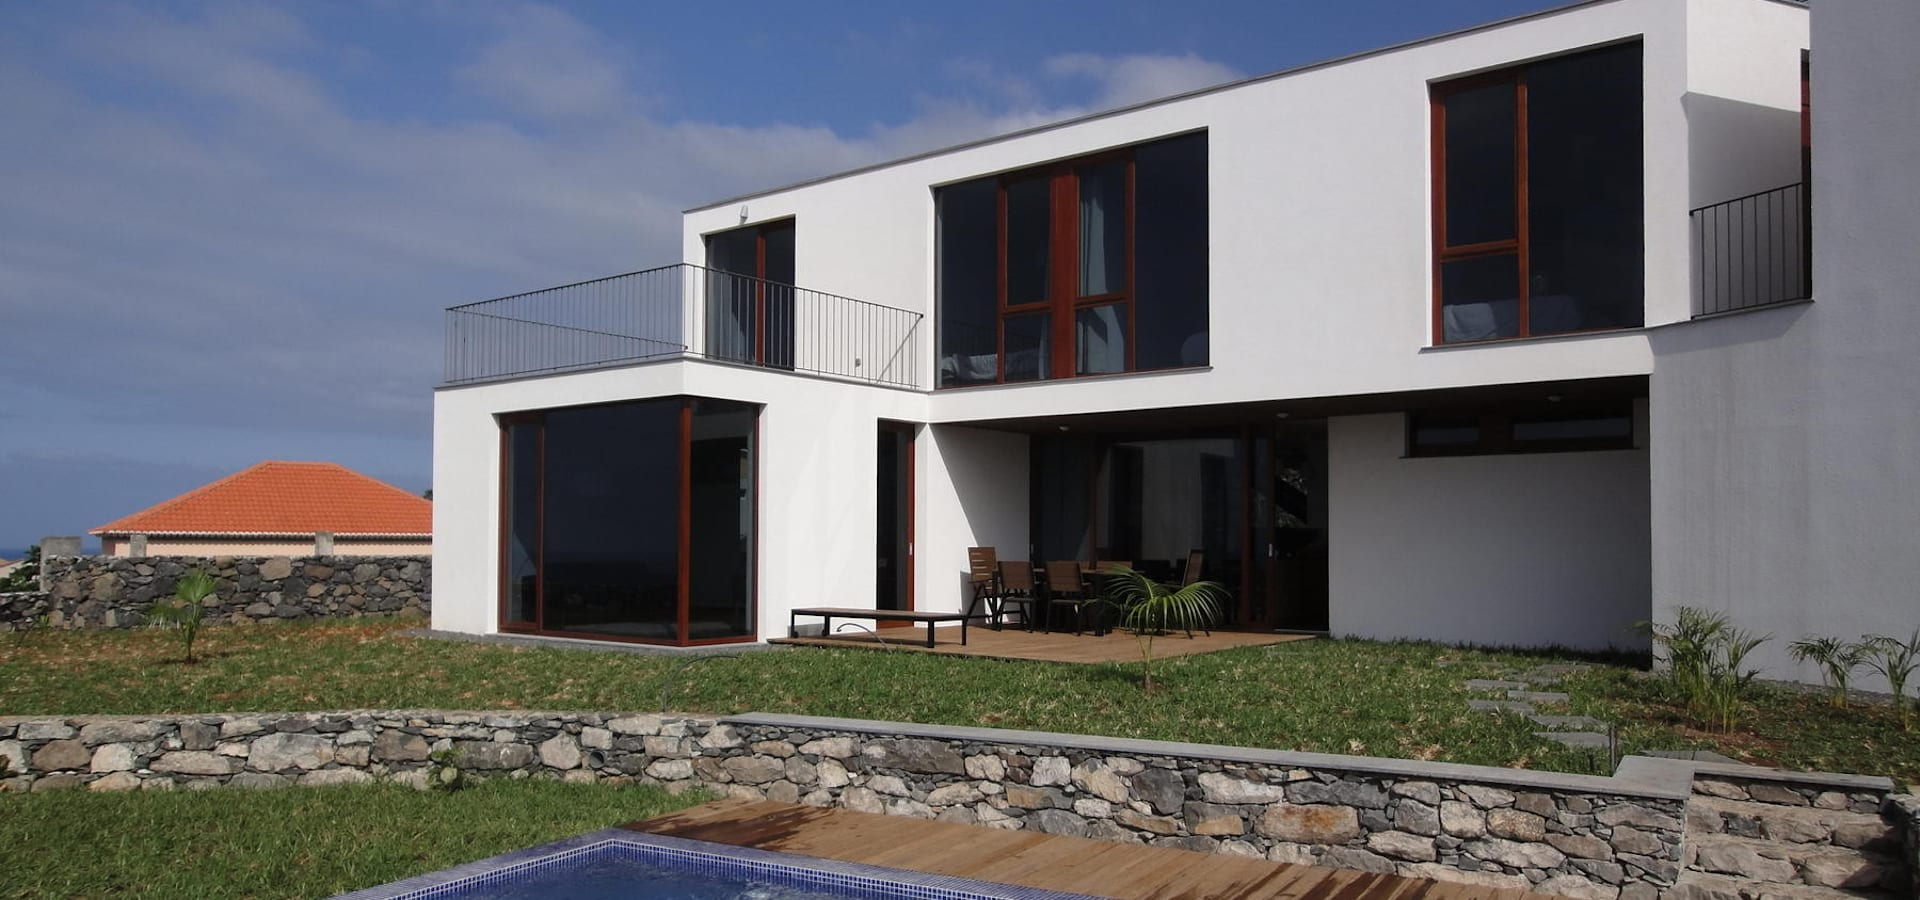 Mayer & Selders Arquitectura